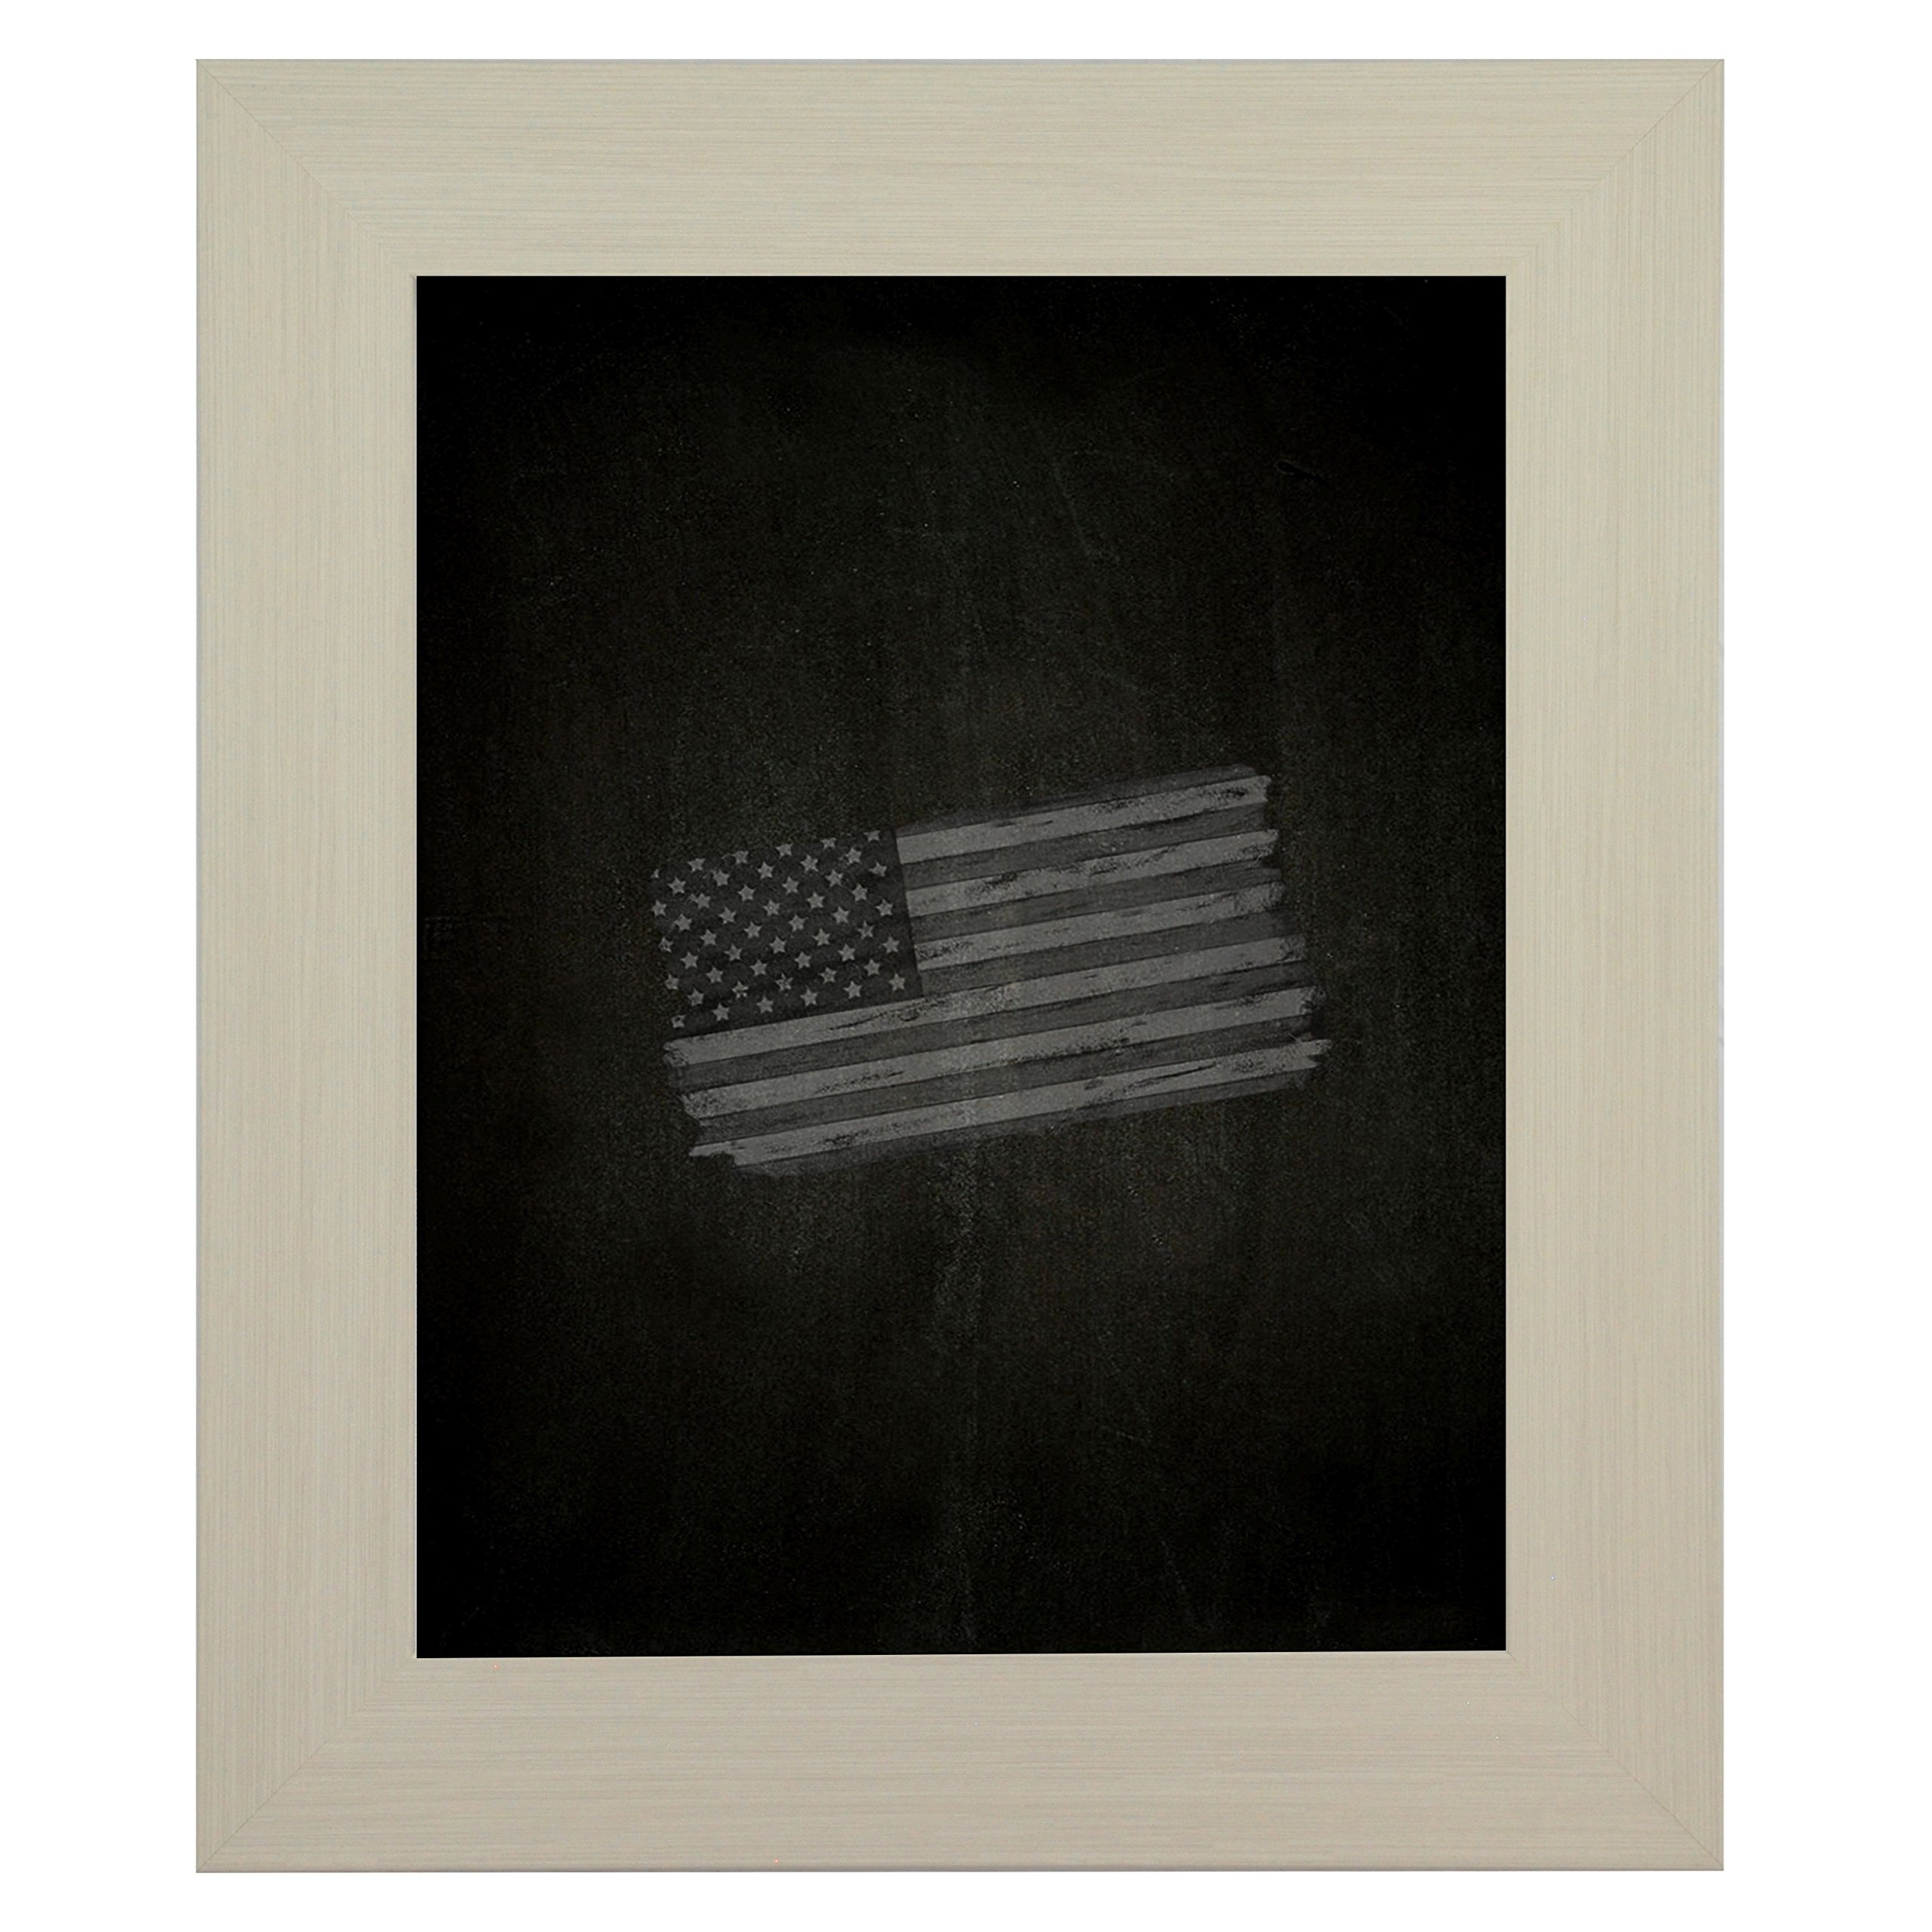 Rayne Mirrors American Made Rayne Arctic Ivory Blackboard/ Chalkboard Exterior Size: 36 x 54 by Rayne Mirrors